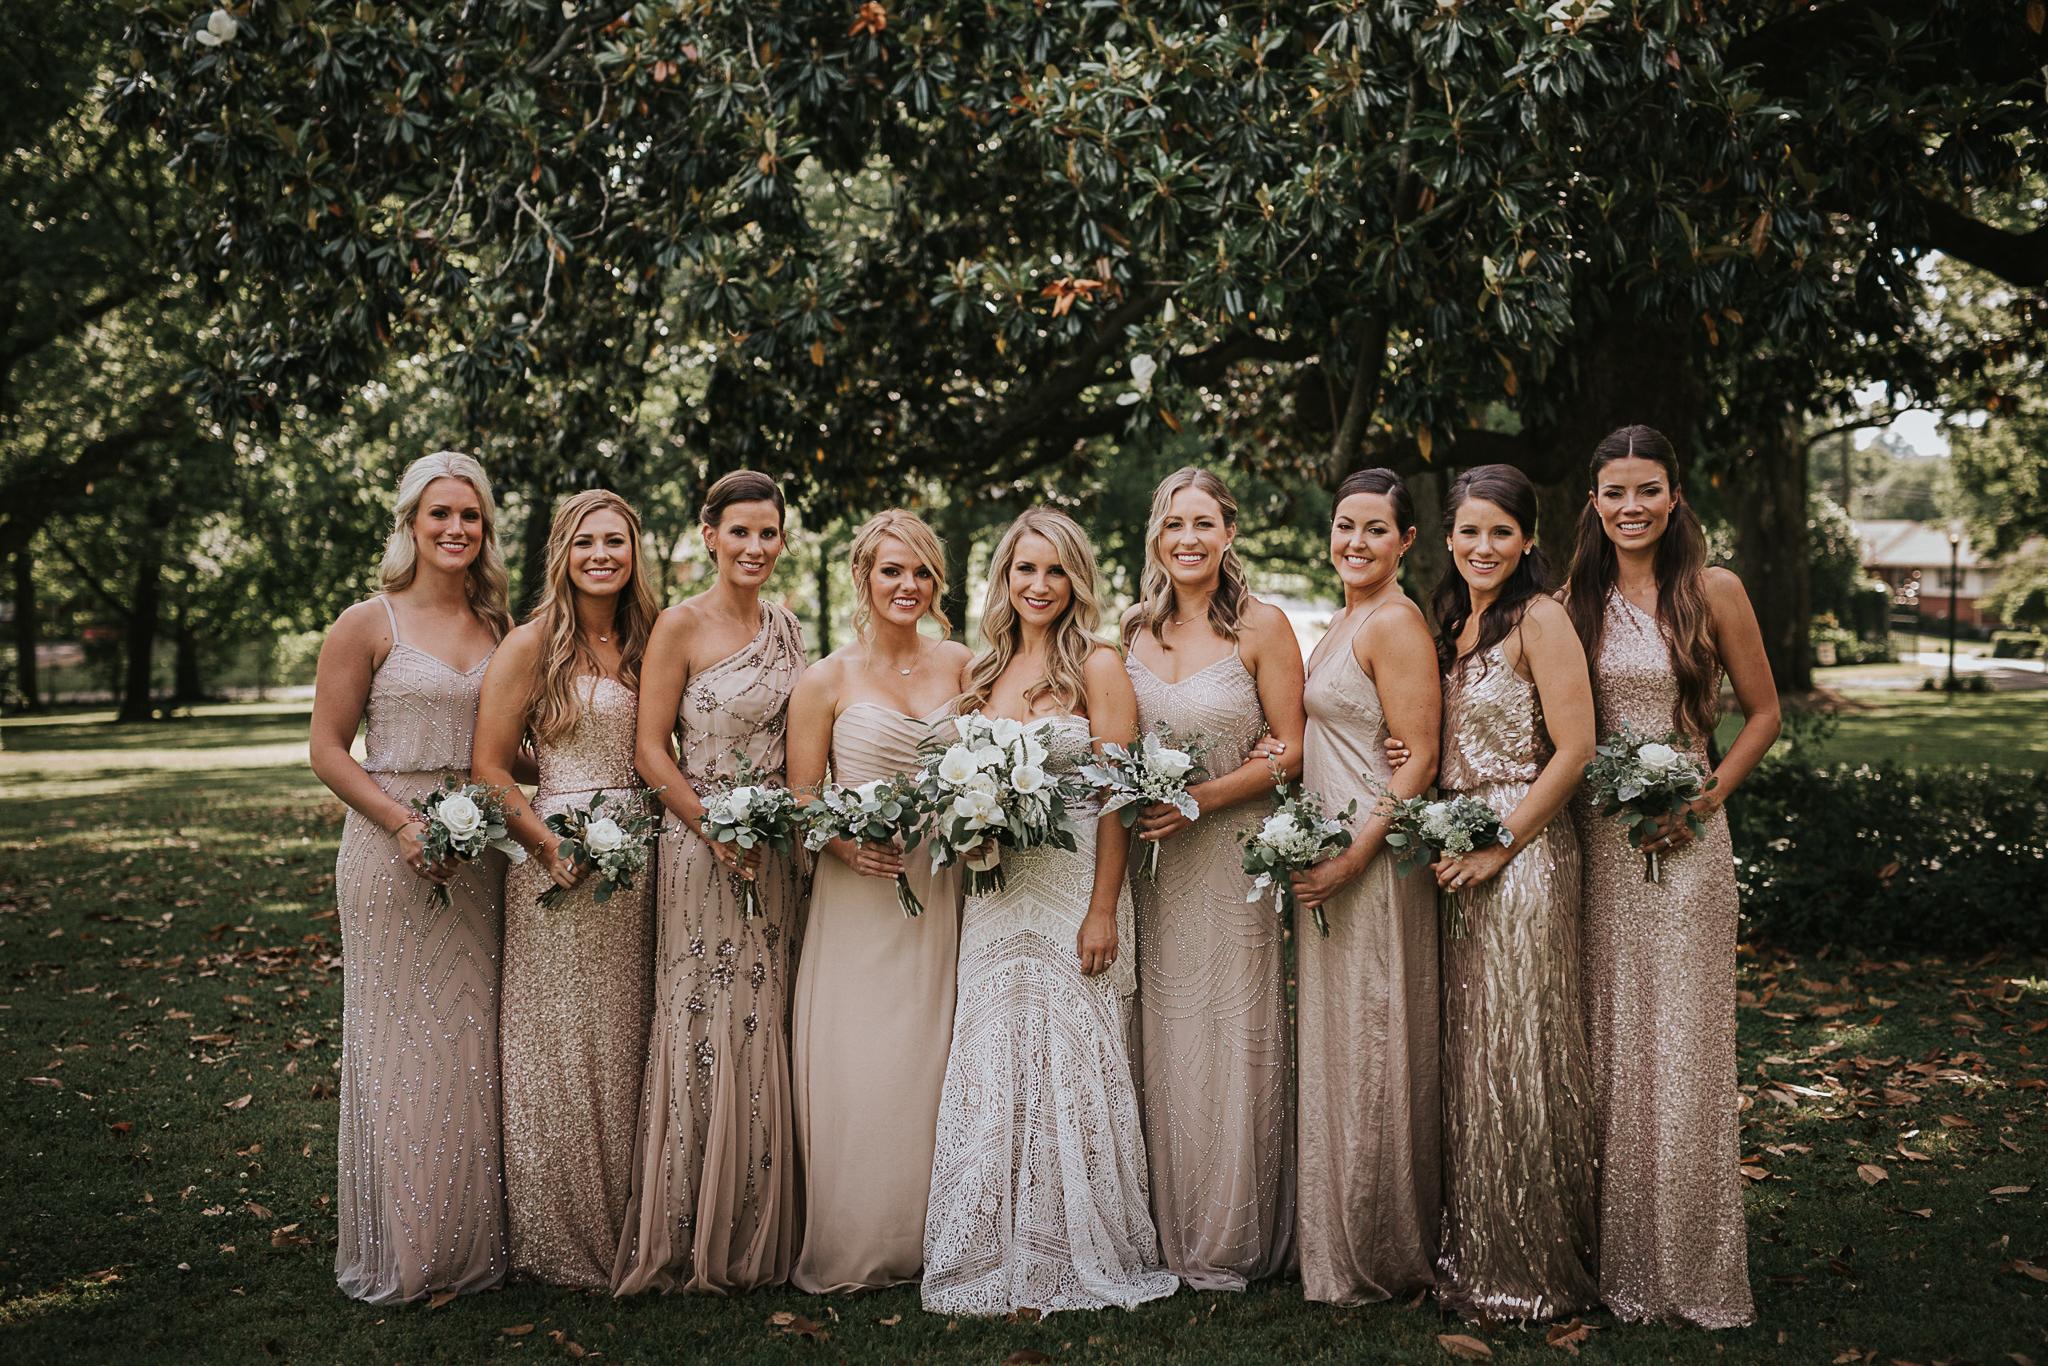 best-wedding-photographers-nashville-tn-27.jpg